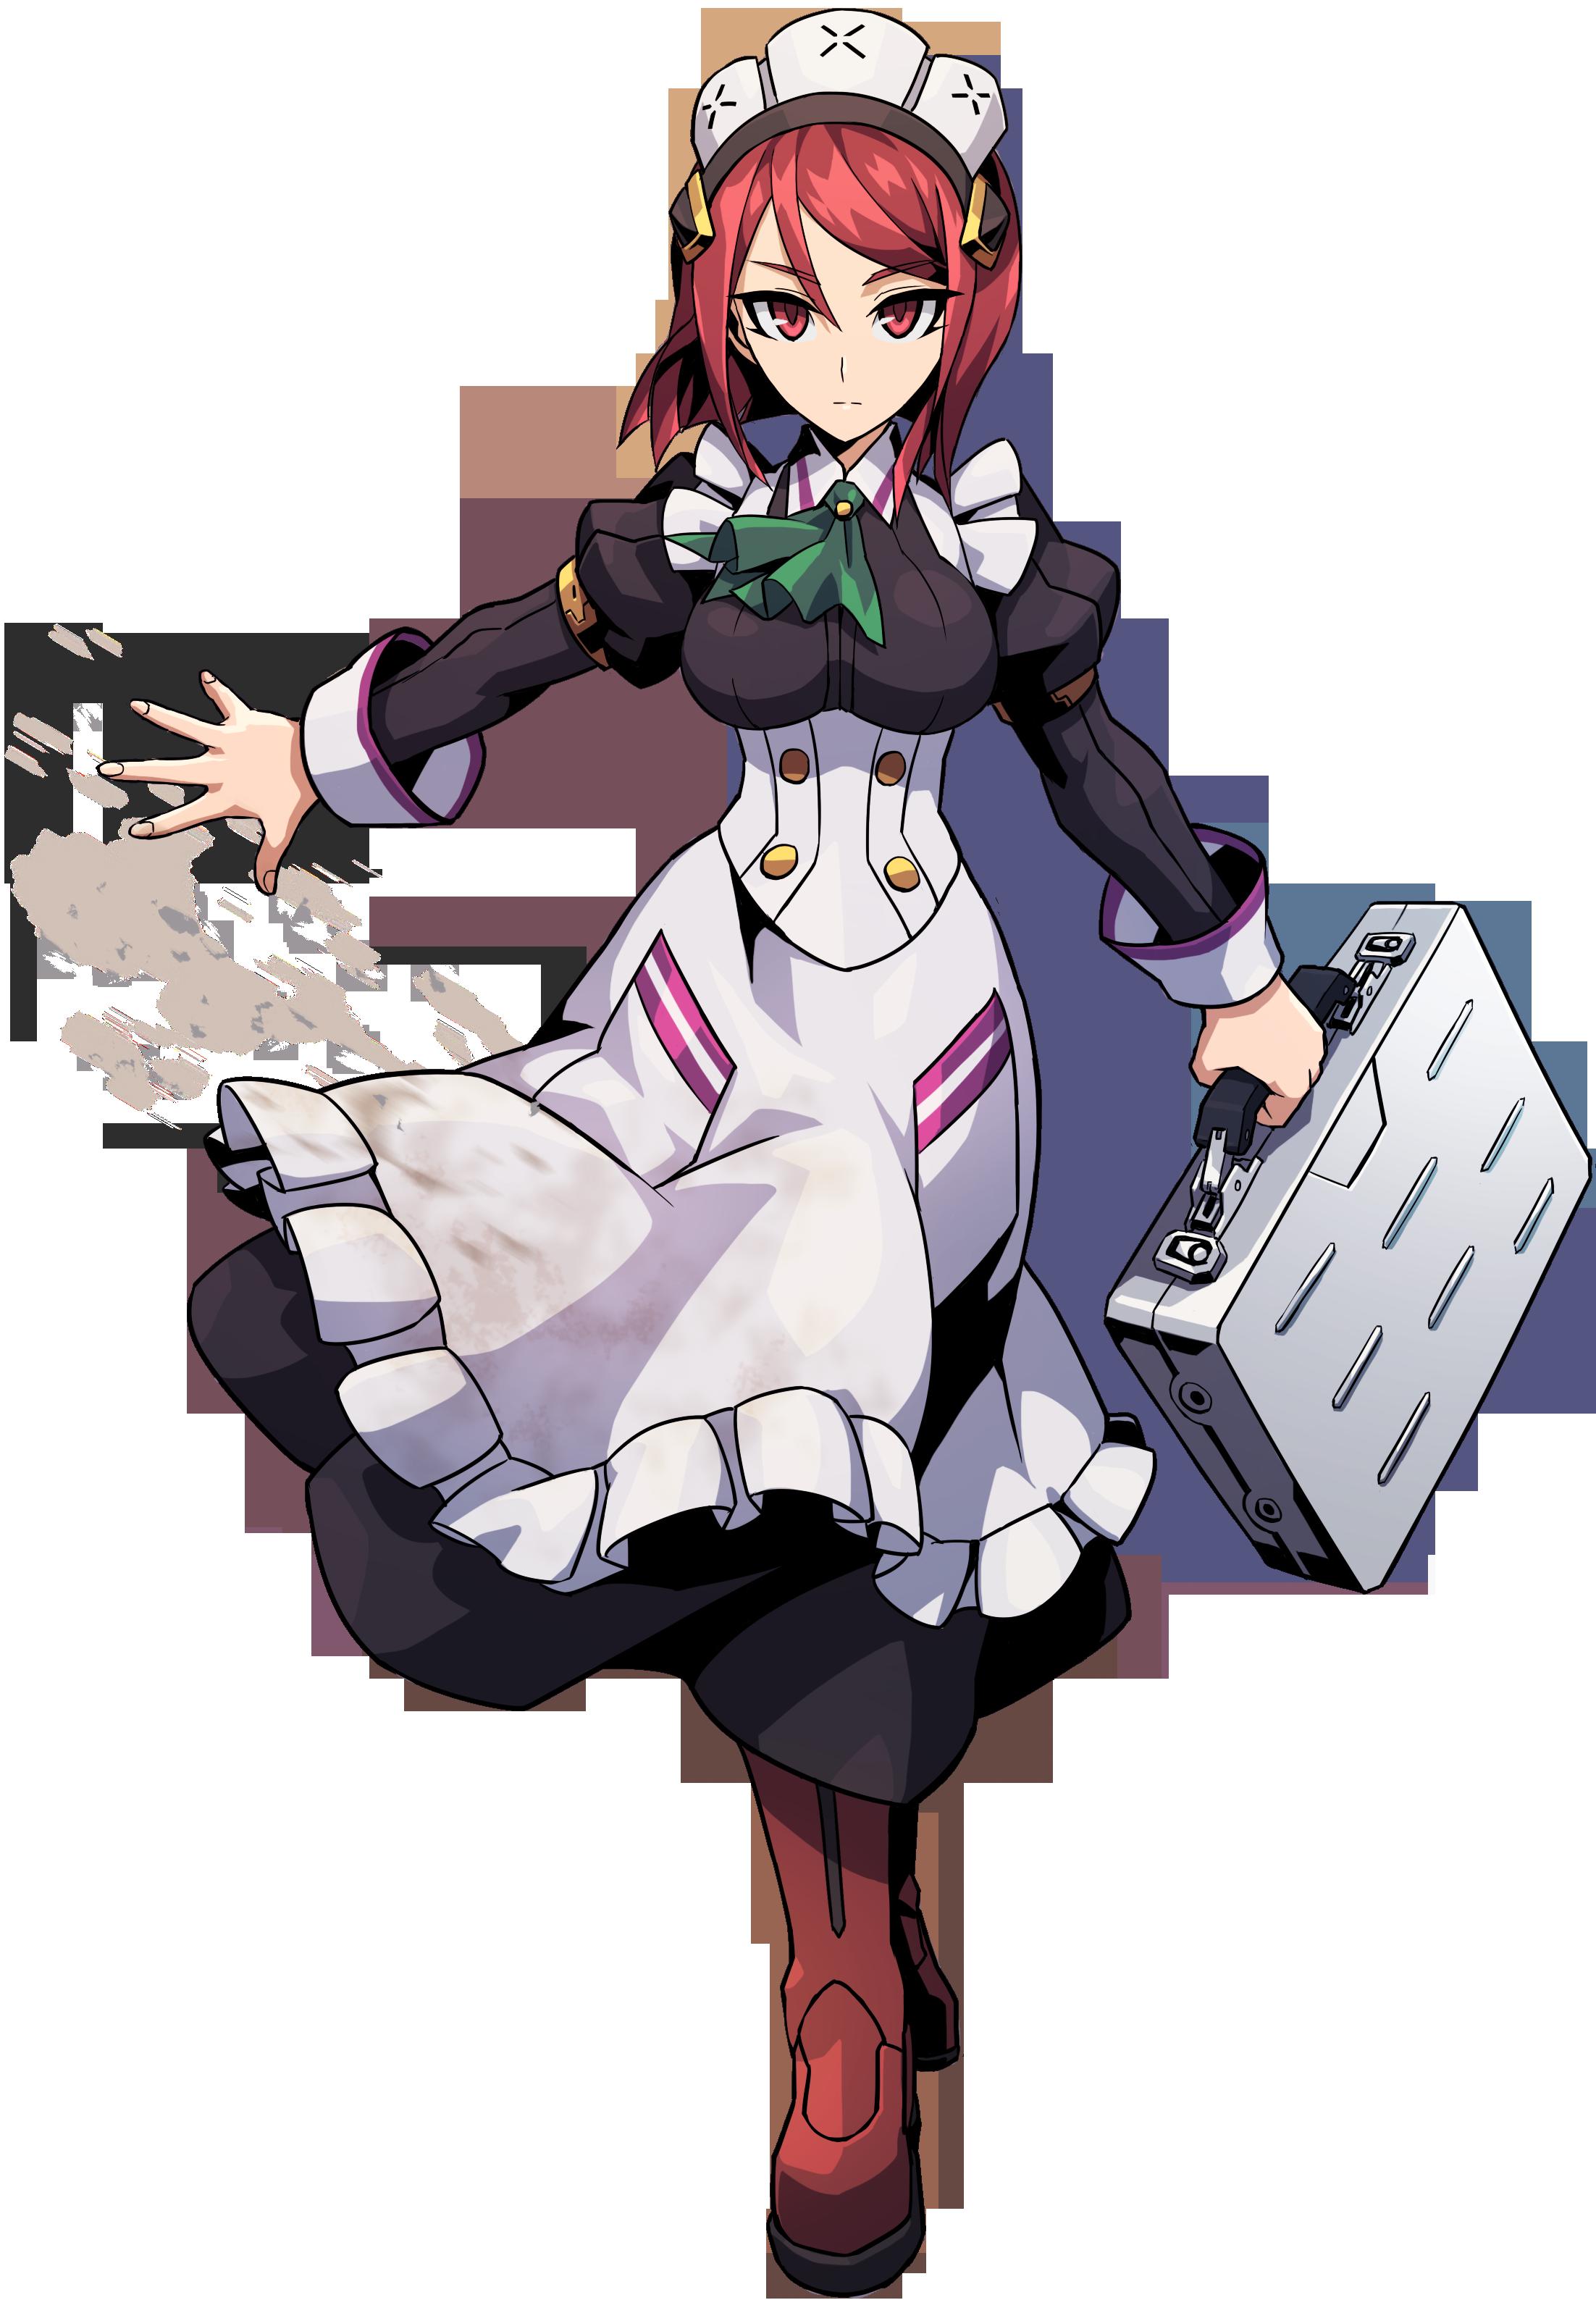 Maid clipart headband. Nori azure striker wiki